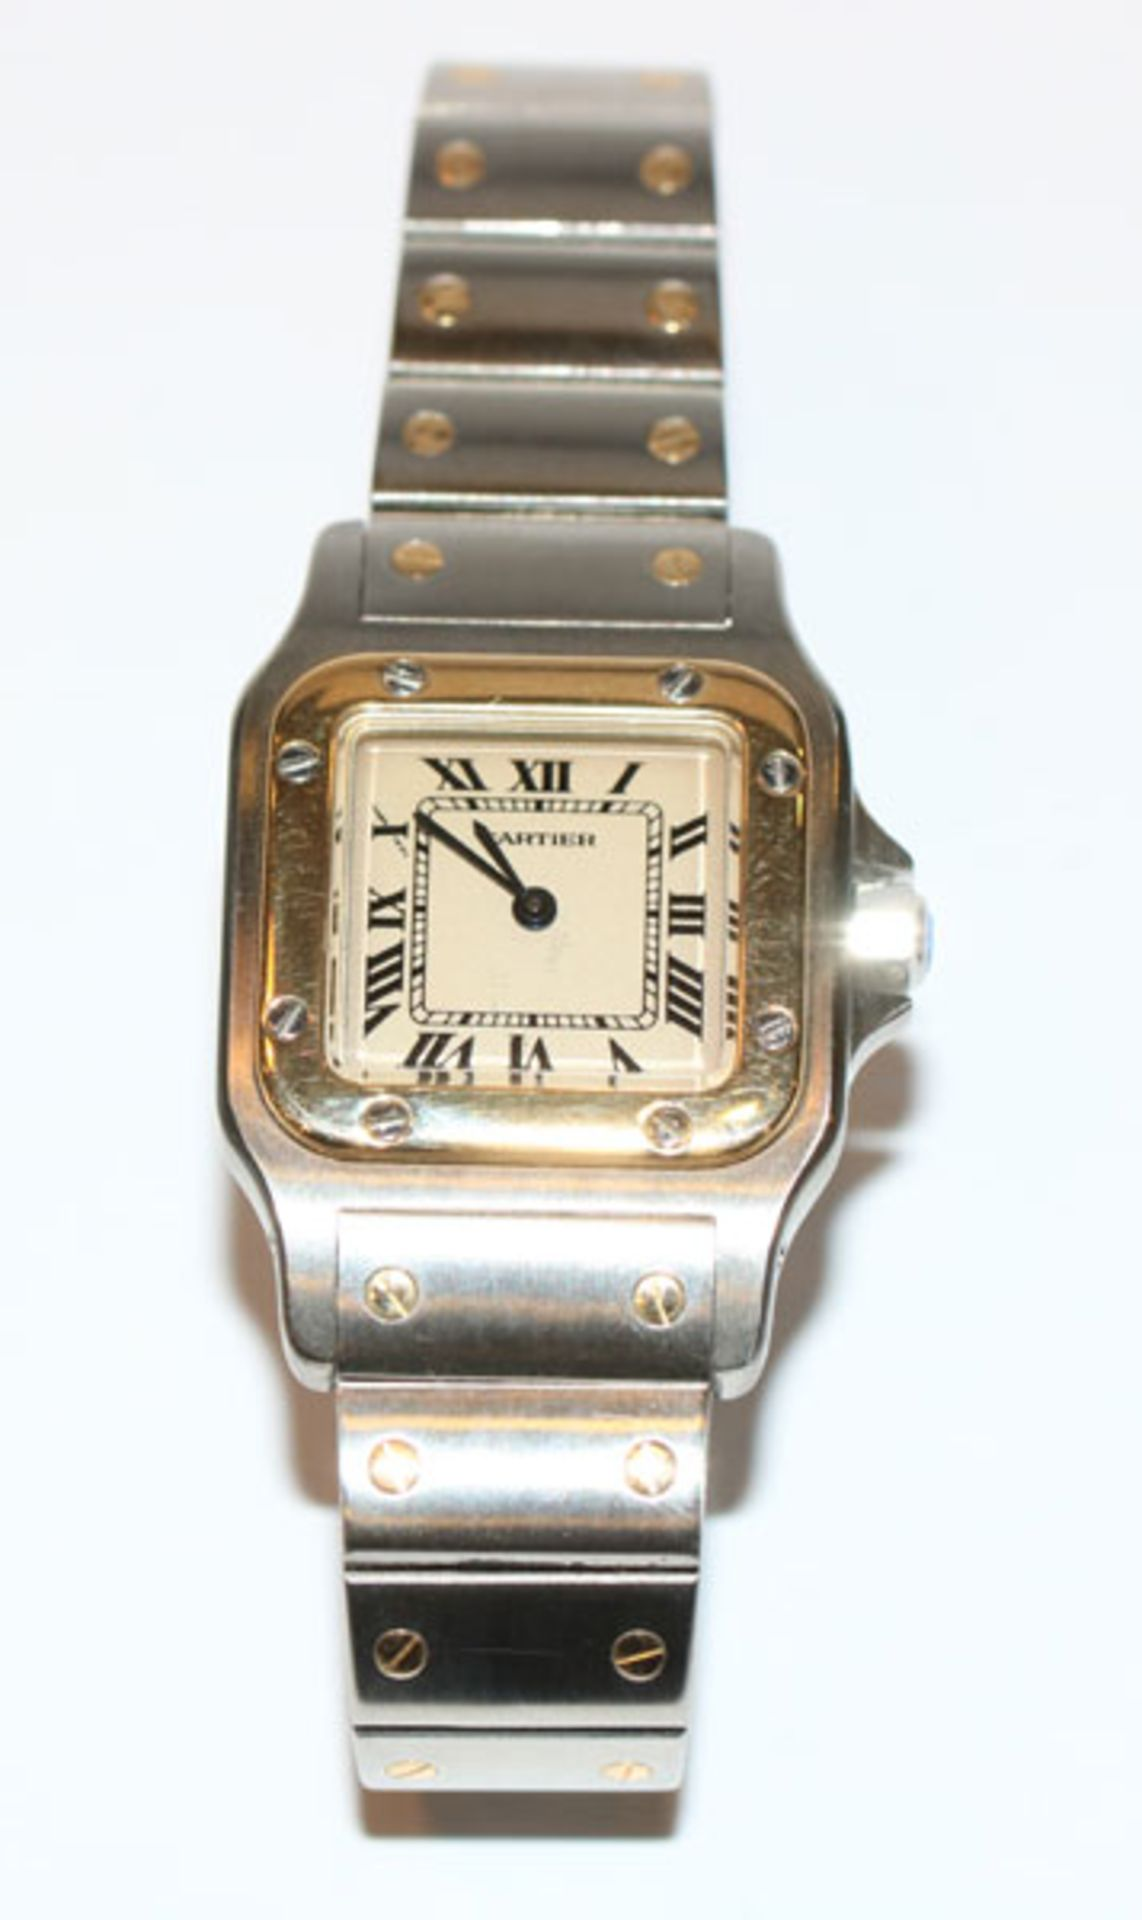 Los 32 - Cartier Damen-Armbanduhr, Santos Carrée, Edelstahl/Gelbgold, intakt, ohne Papiere, Tragespuren,